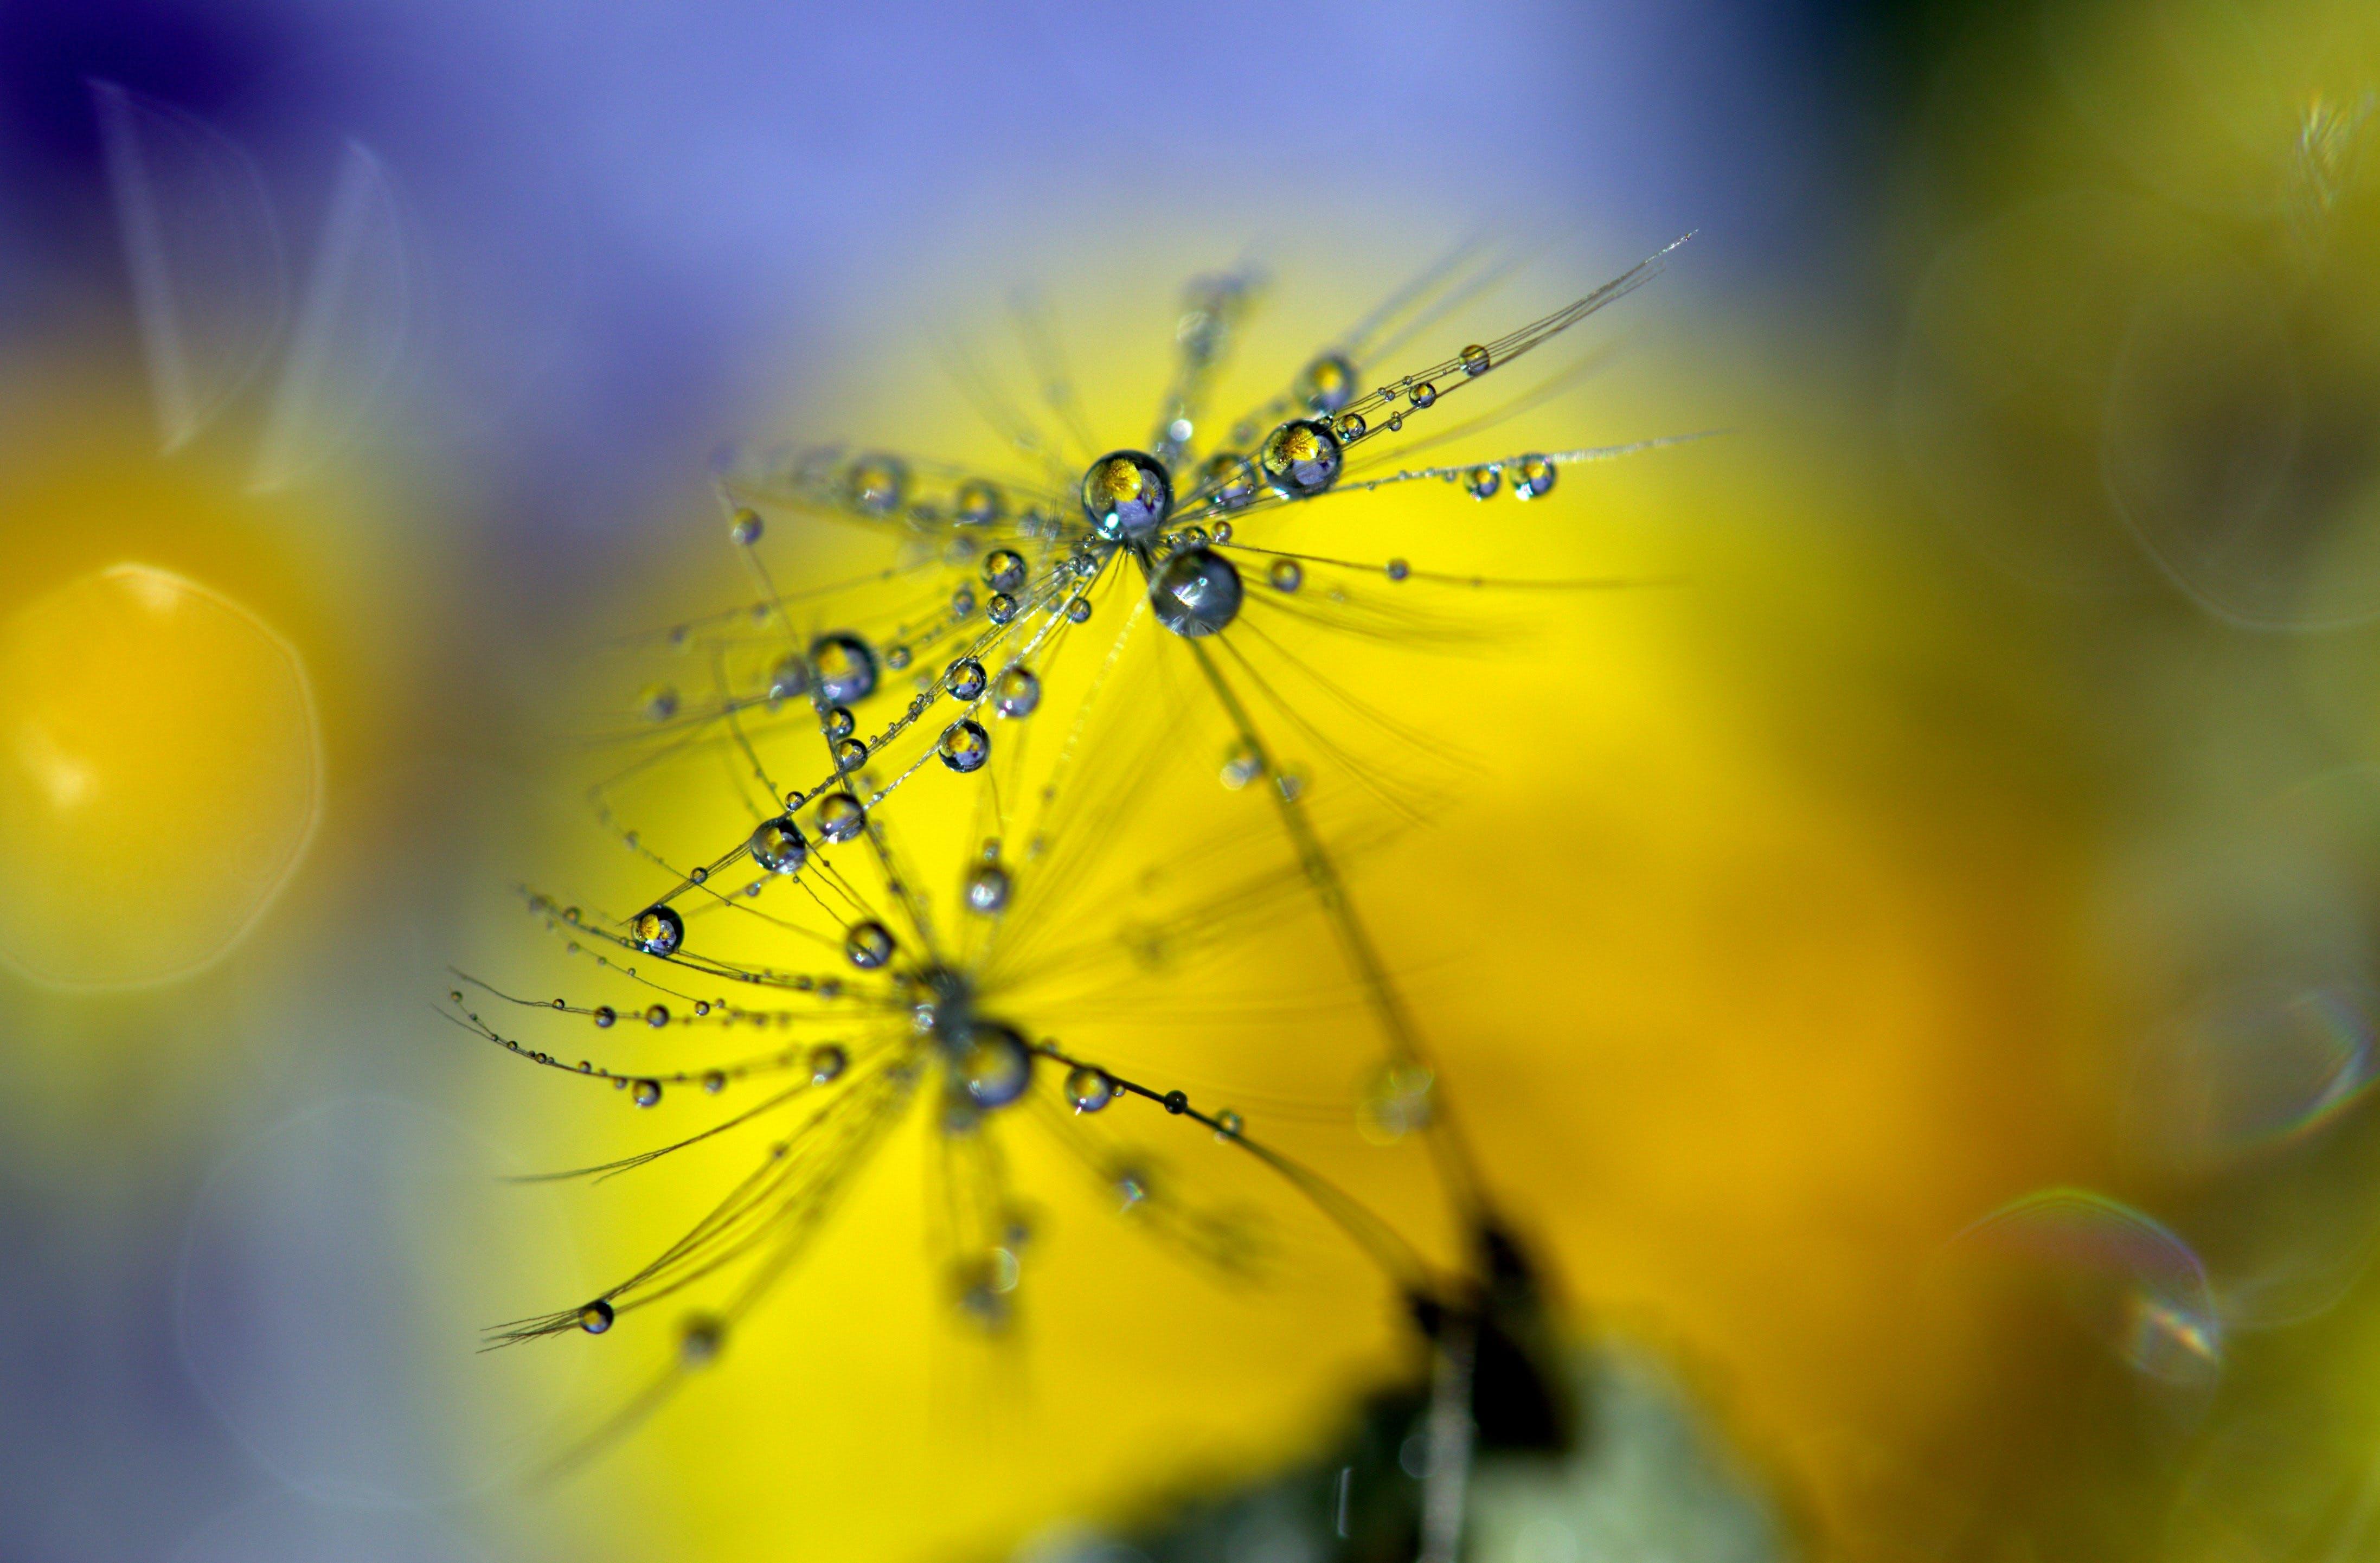 Selective Focus of Dandelion Flowers